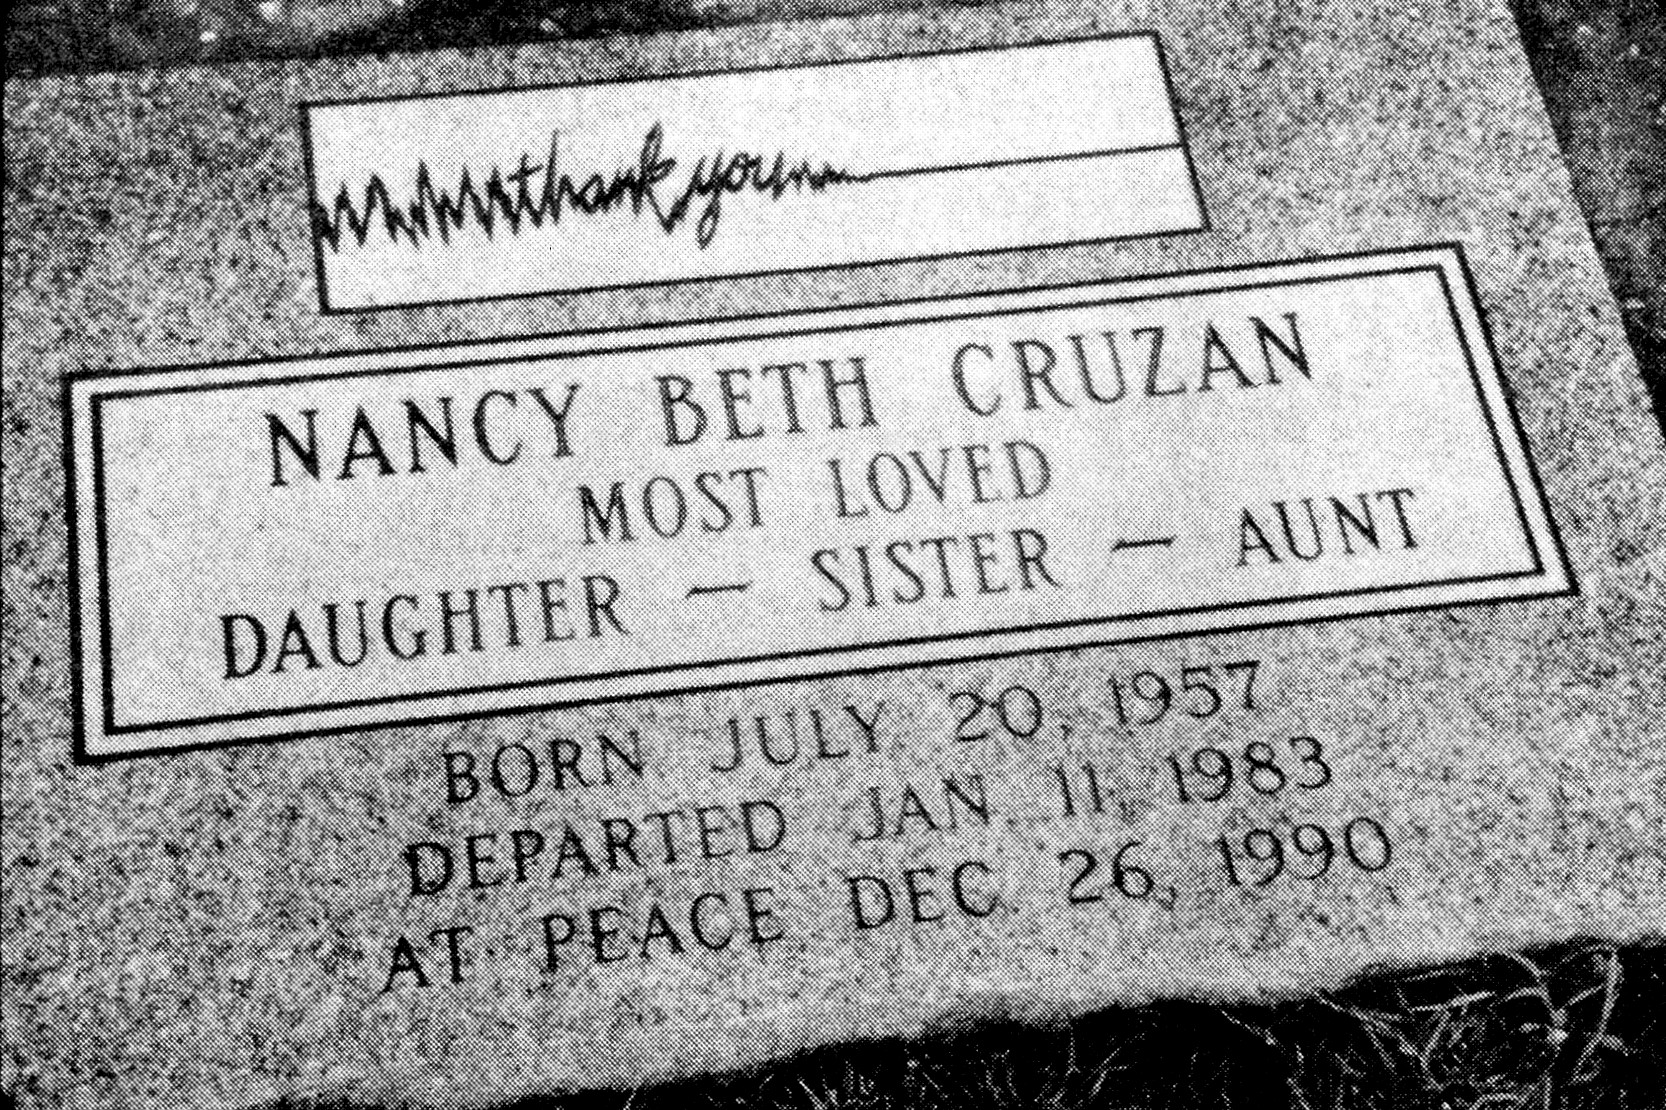 Cruzan by Cruzan v. Director, Missouri Department of Health